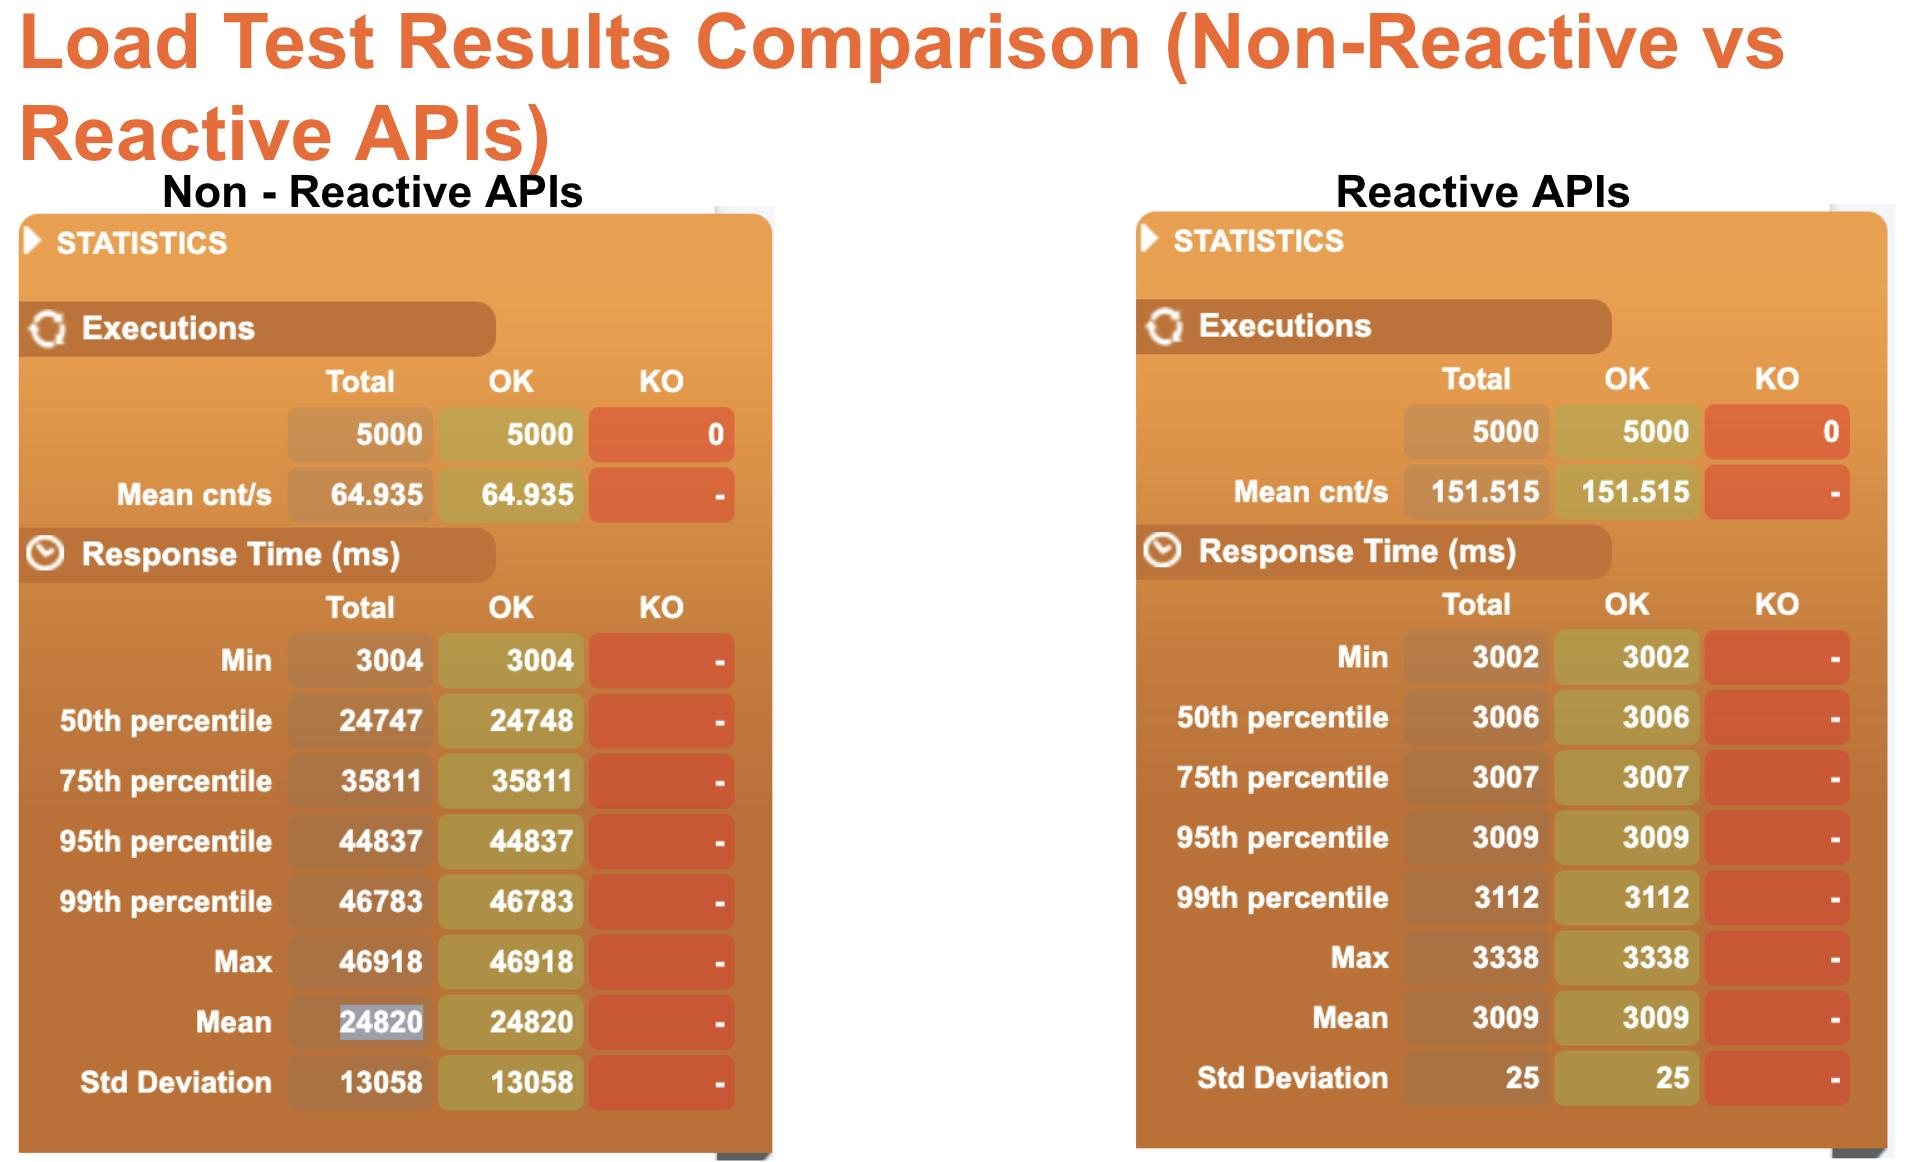 Load Test Results Comparison (Non-Reactive vs Reactive APIs)